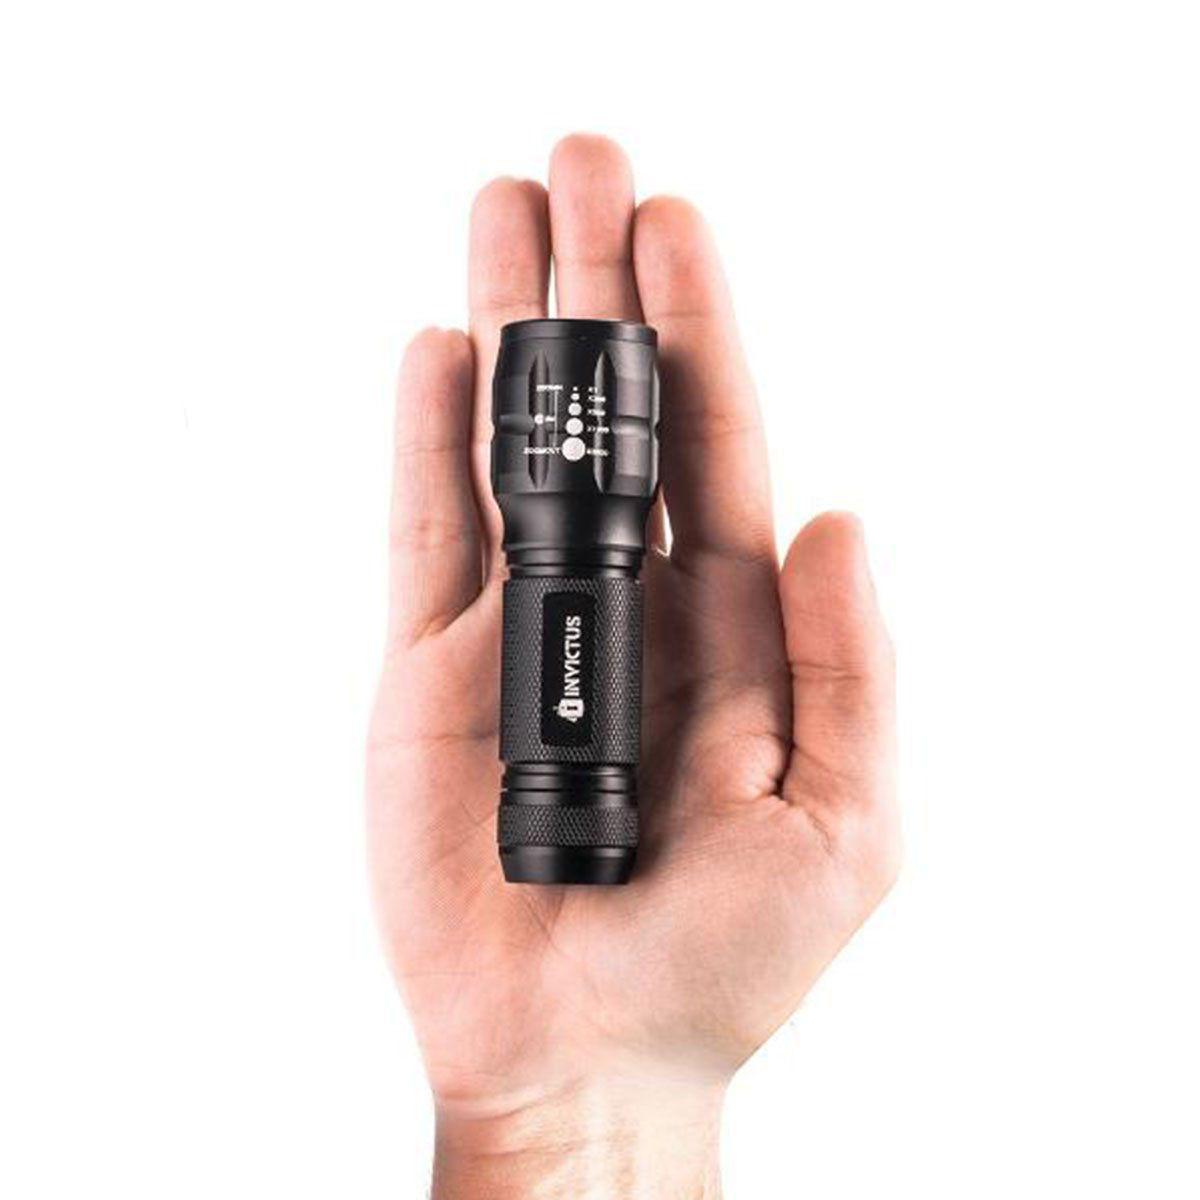 Lanterna Tática Invictus One 80 Lumens